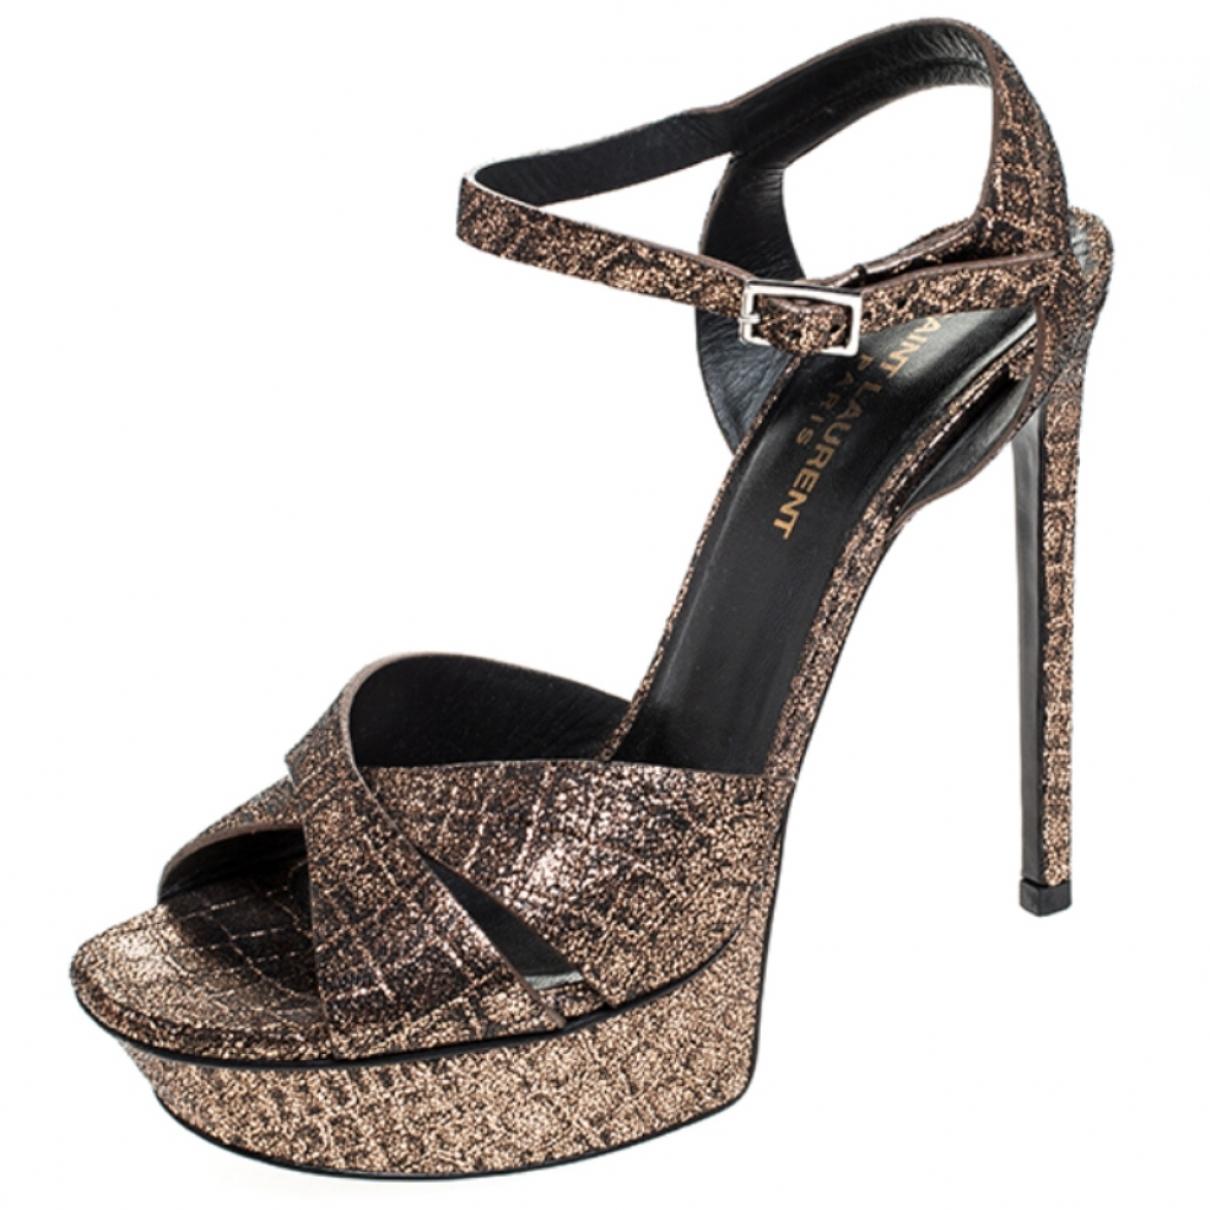 Saint Laurent \N Metallic Leather Sandals for Women 38.5 EU